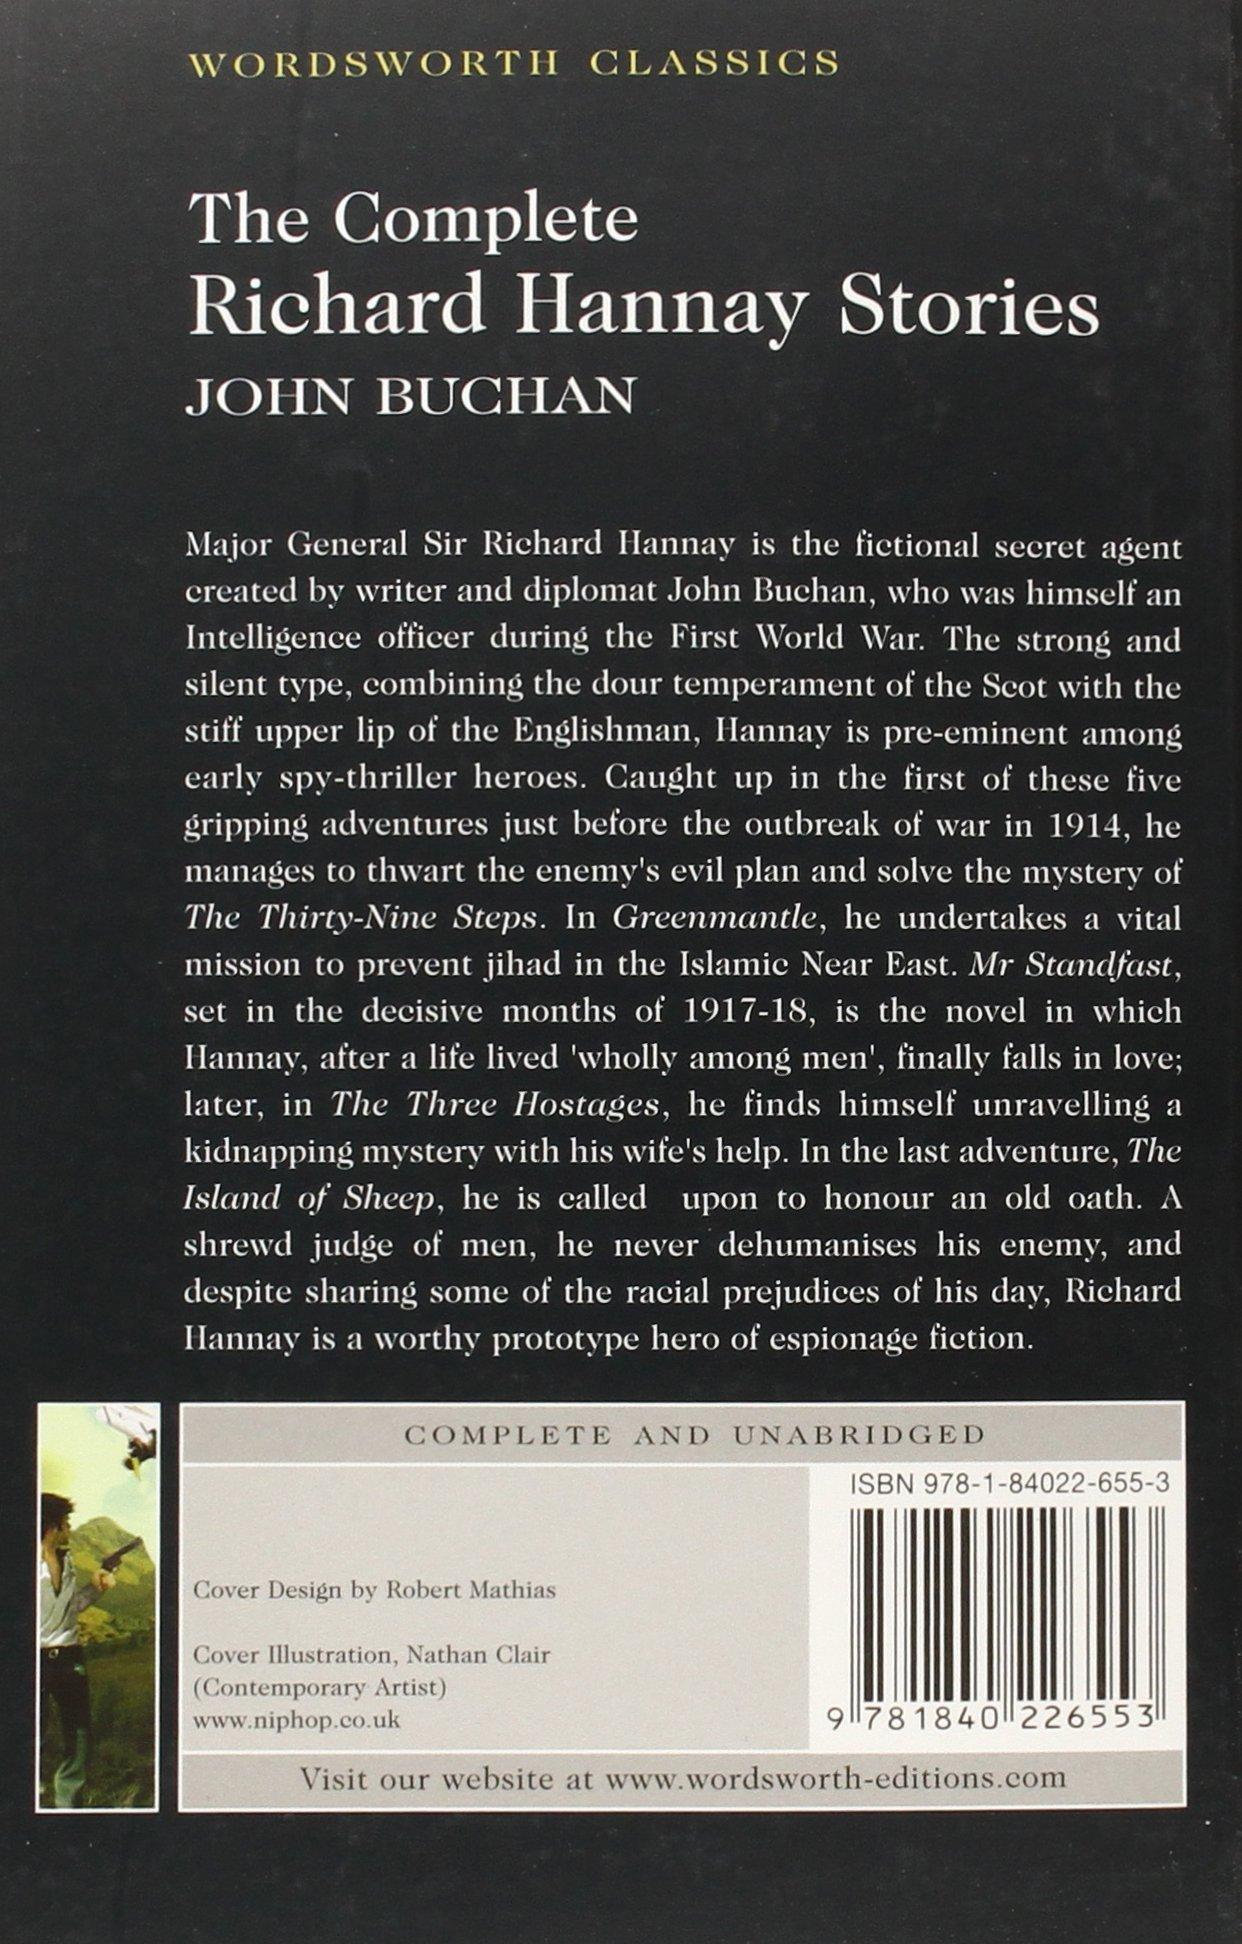 Theplete Richard Hannay Stories (wordsworth Classics): John Buchan:  9781840226553: Amazon: Books